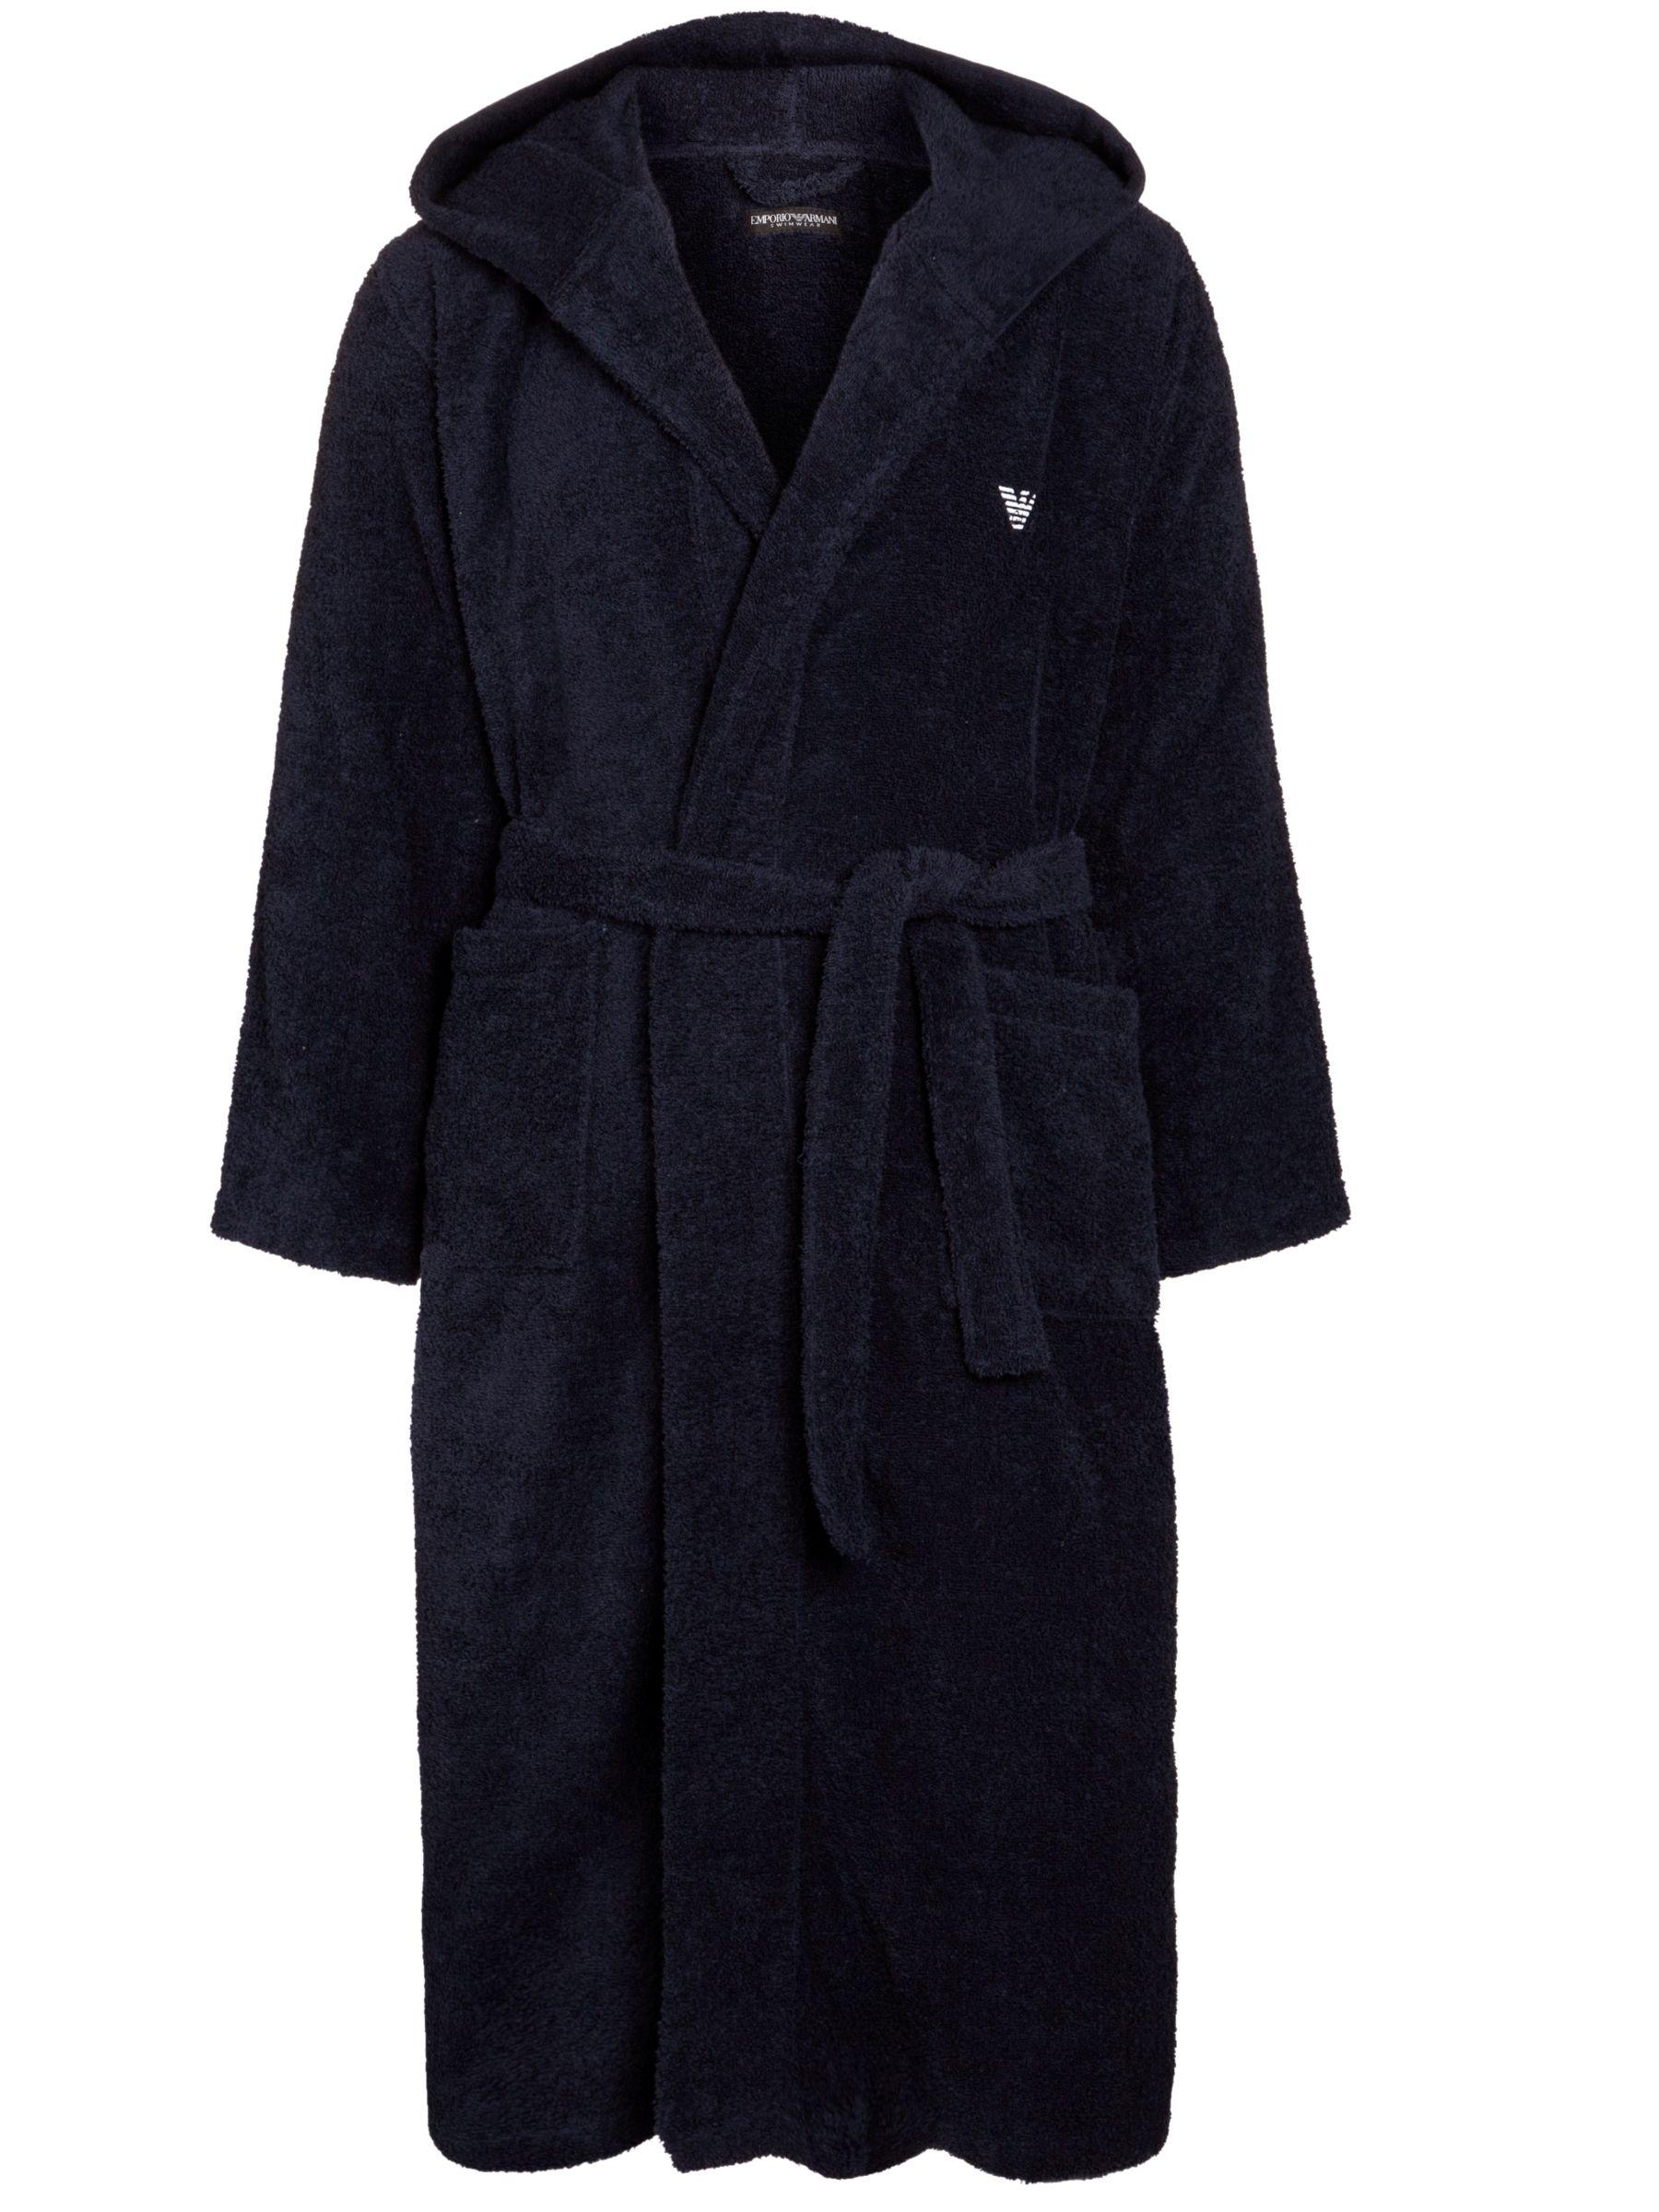 Emporio Armani Towelling Dressing Robe, Navy